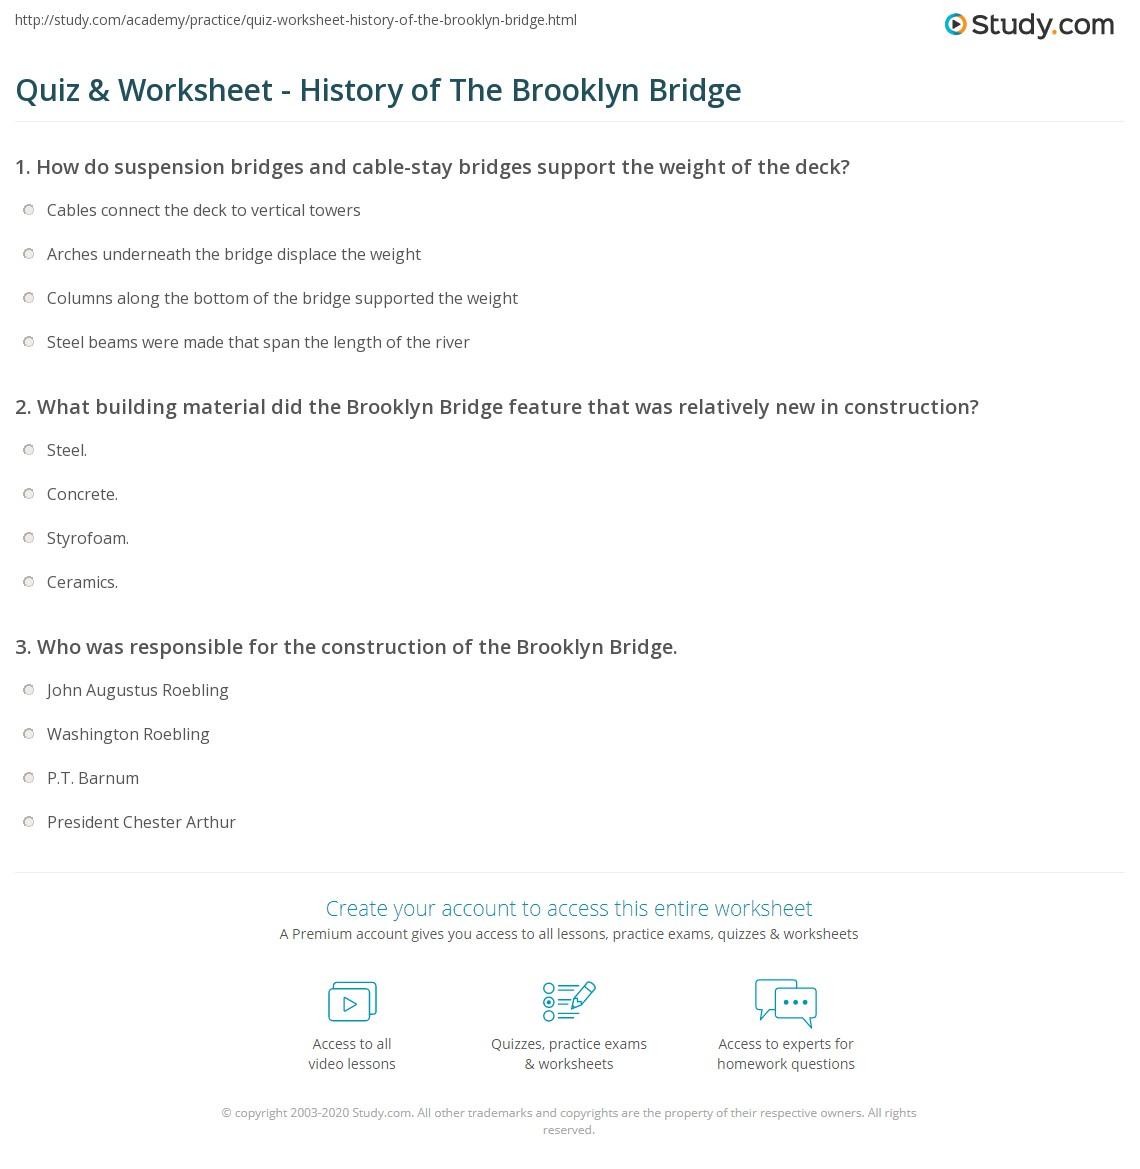 Quiz & Worksheet History of The Brooklyn Bridge